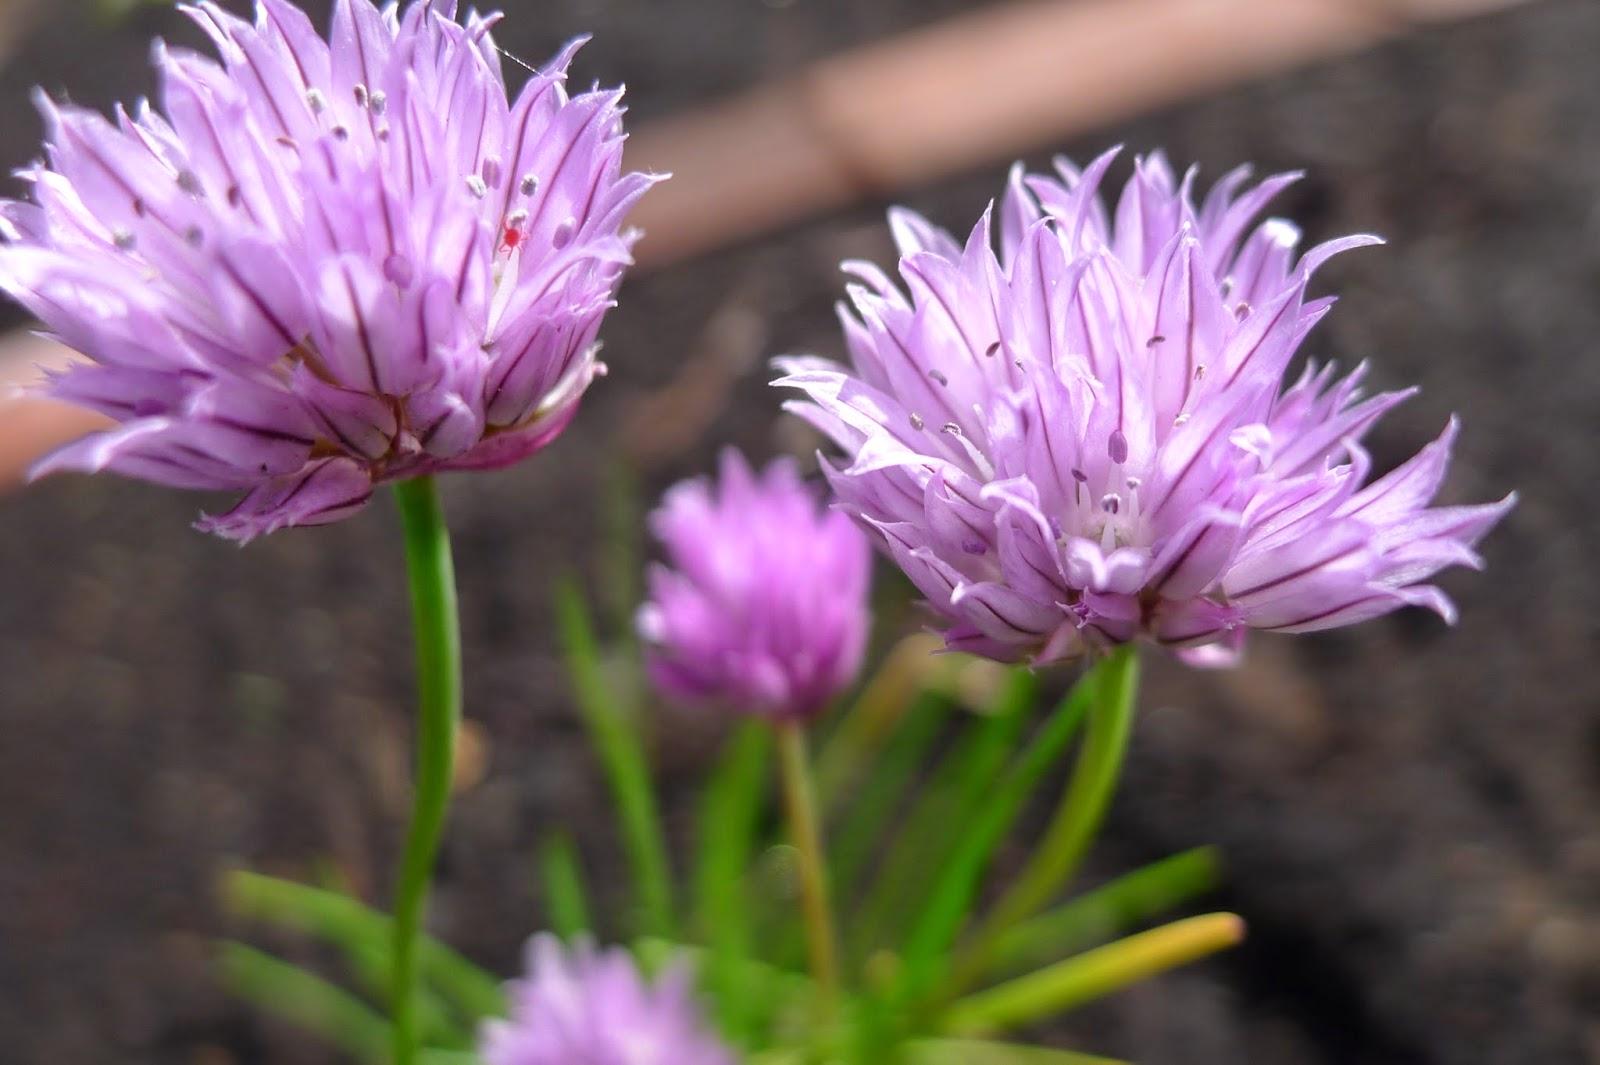 Chive flowers, herbs, urban farming